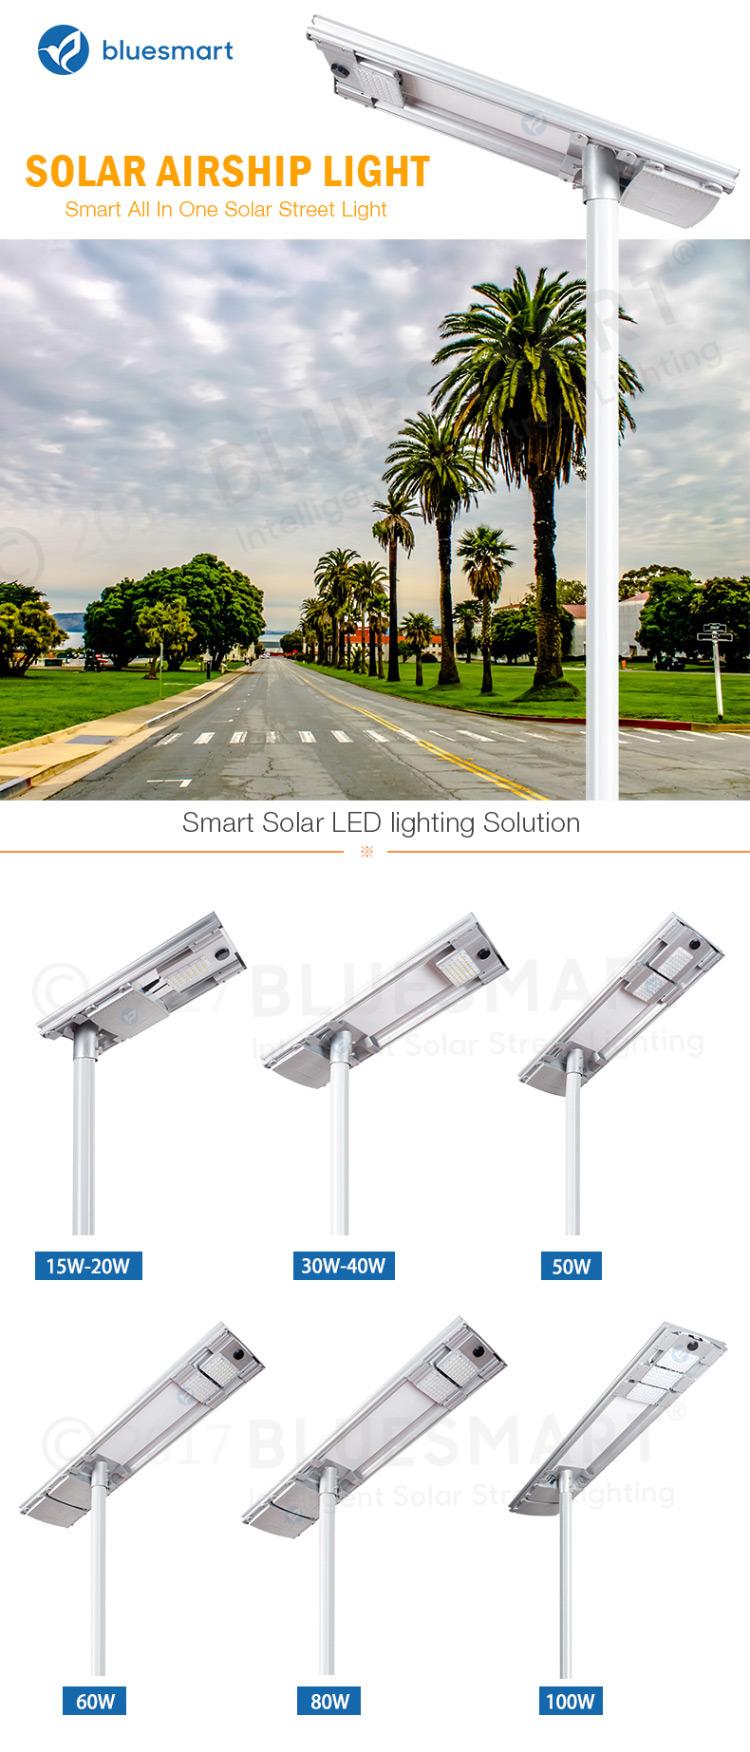 15W/20W/30W/40W/50W/60W/80W/100W Outdoor Integrated/All-in-One Solar Products Motion Sensor LED Street Garden Light